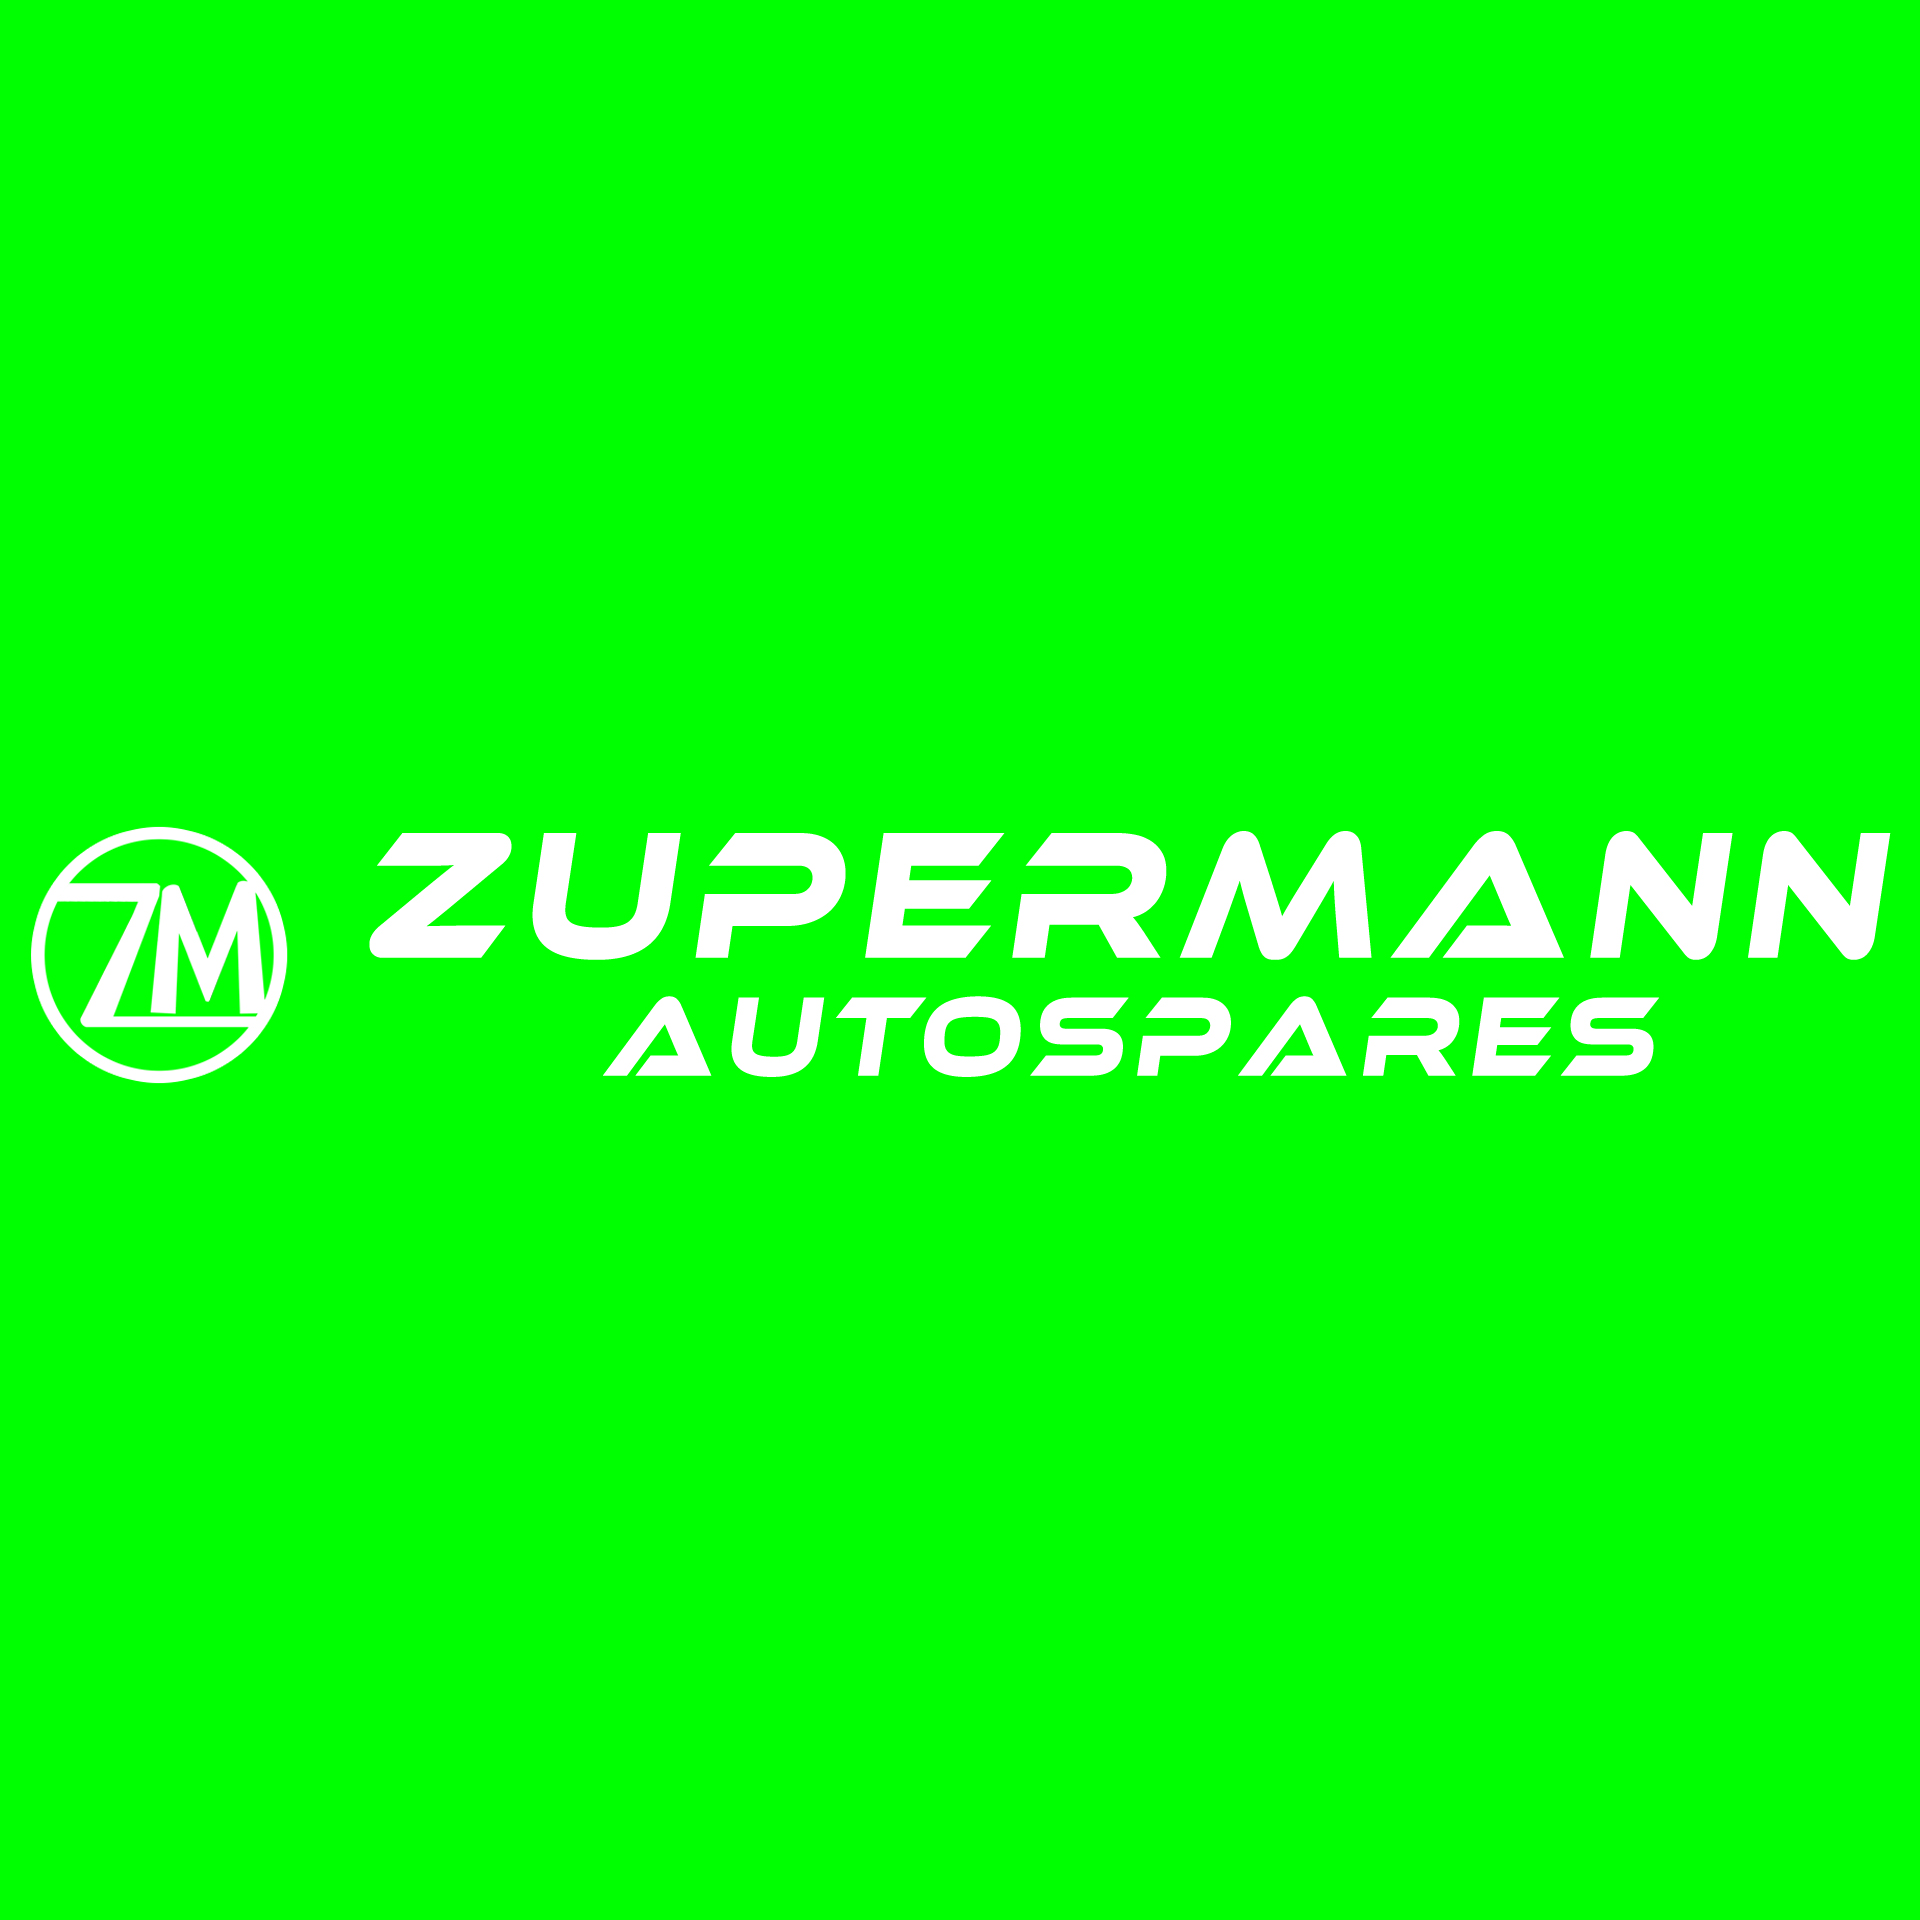 ZUPERMANN AUTOSPARES PTE. LTD.